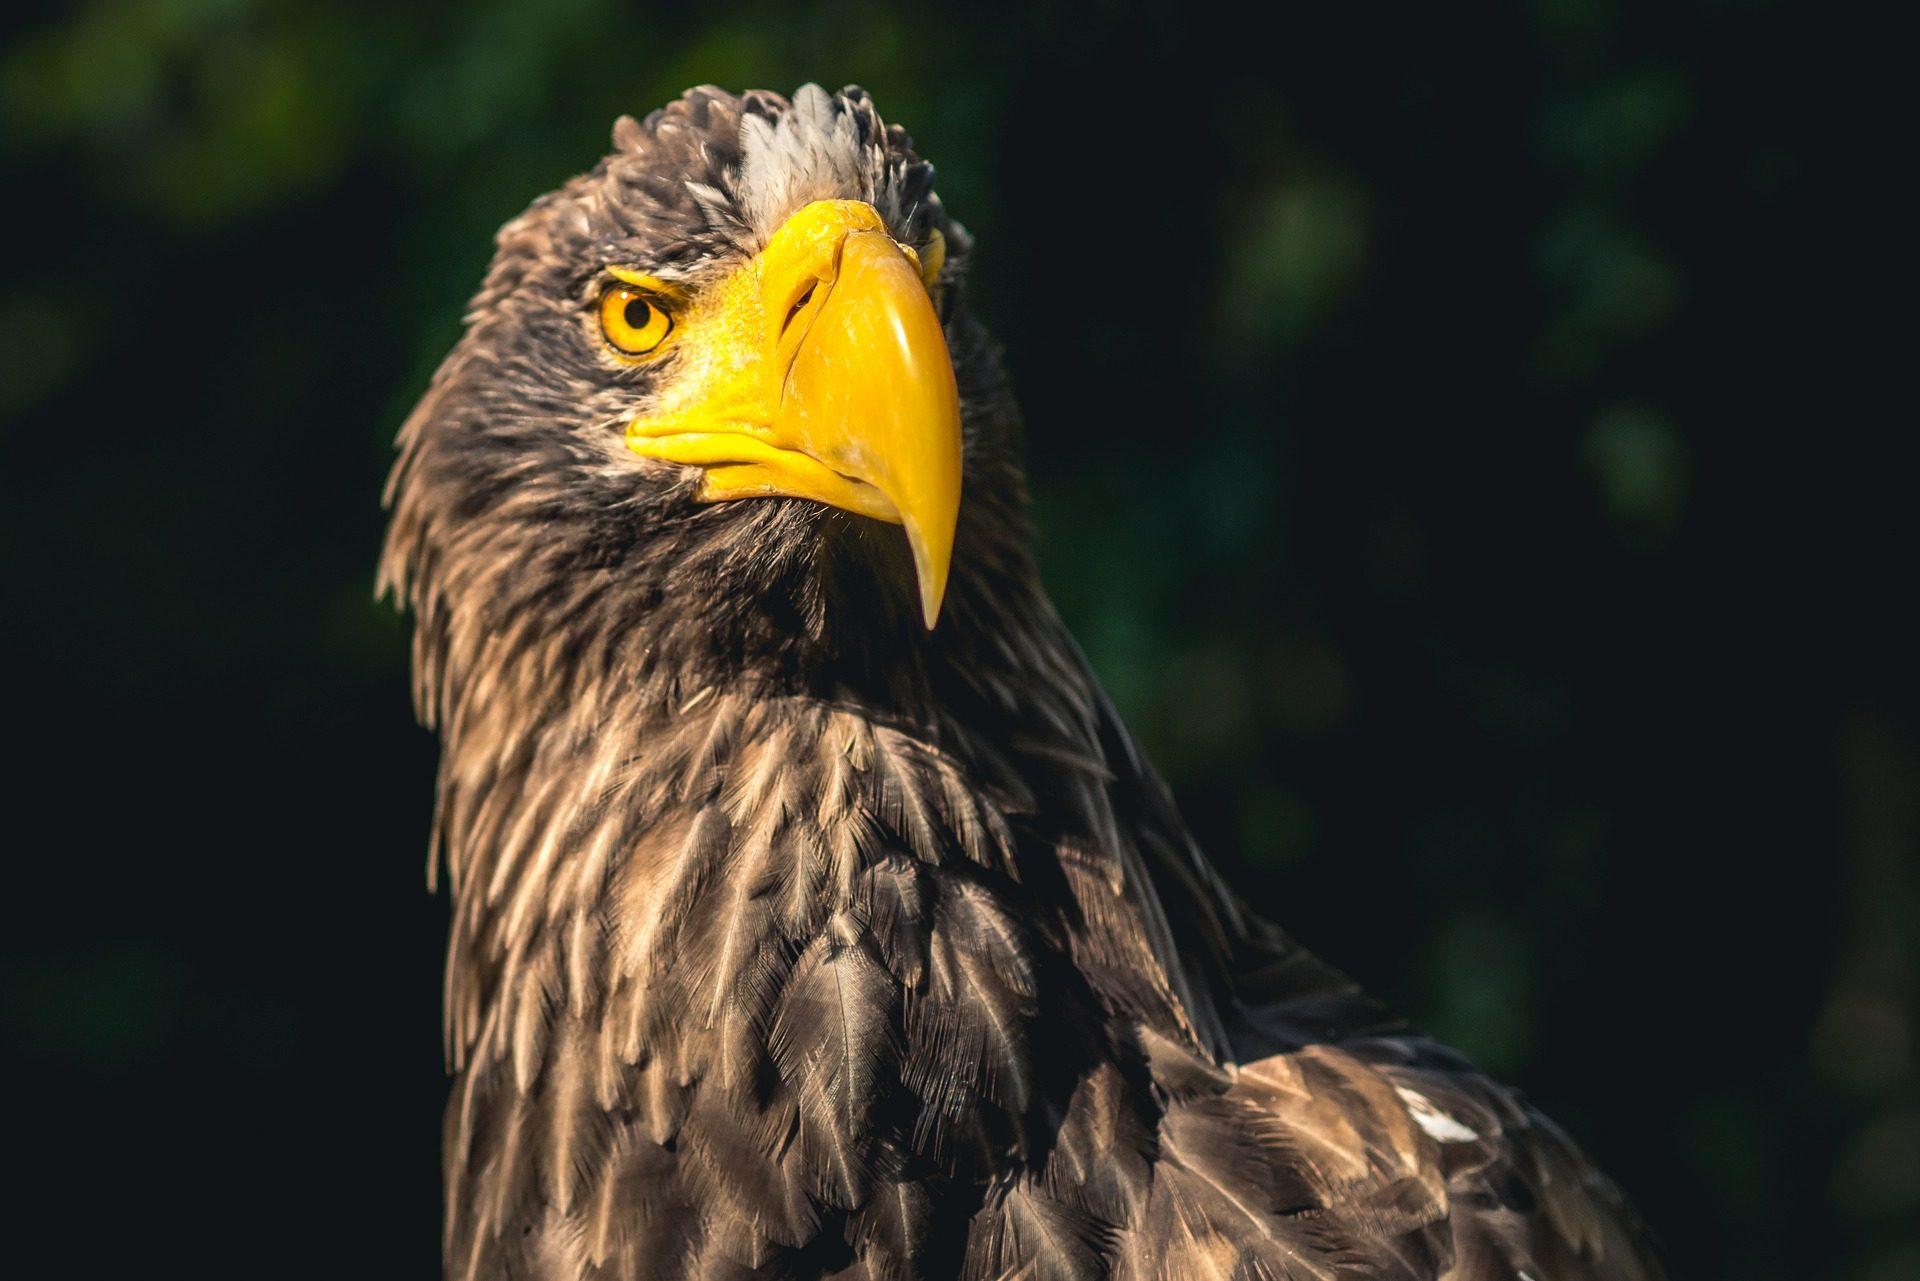 Águila, Ave, Raptor, Gefieder, Peak, Blick - Wallpaper HD - Prof.-falken.com